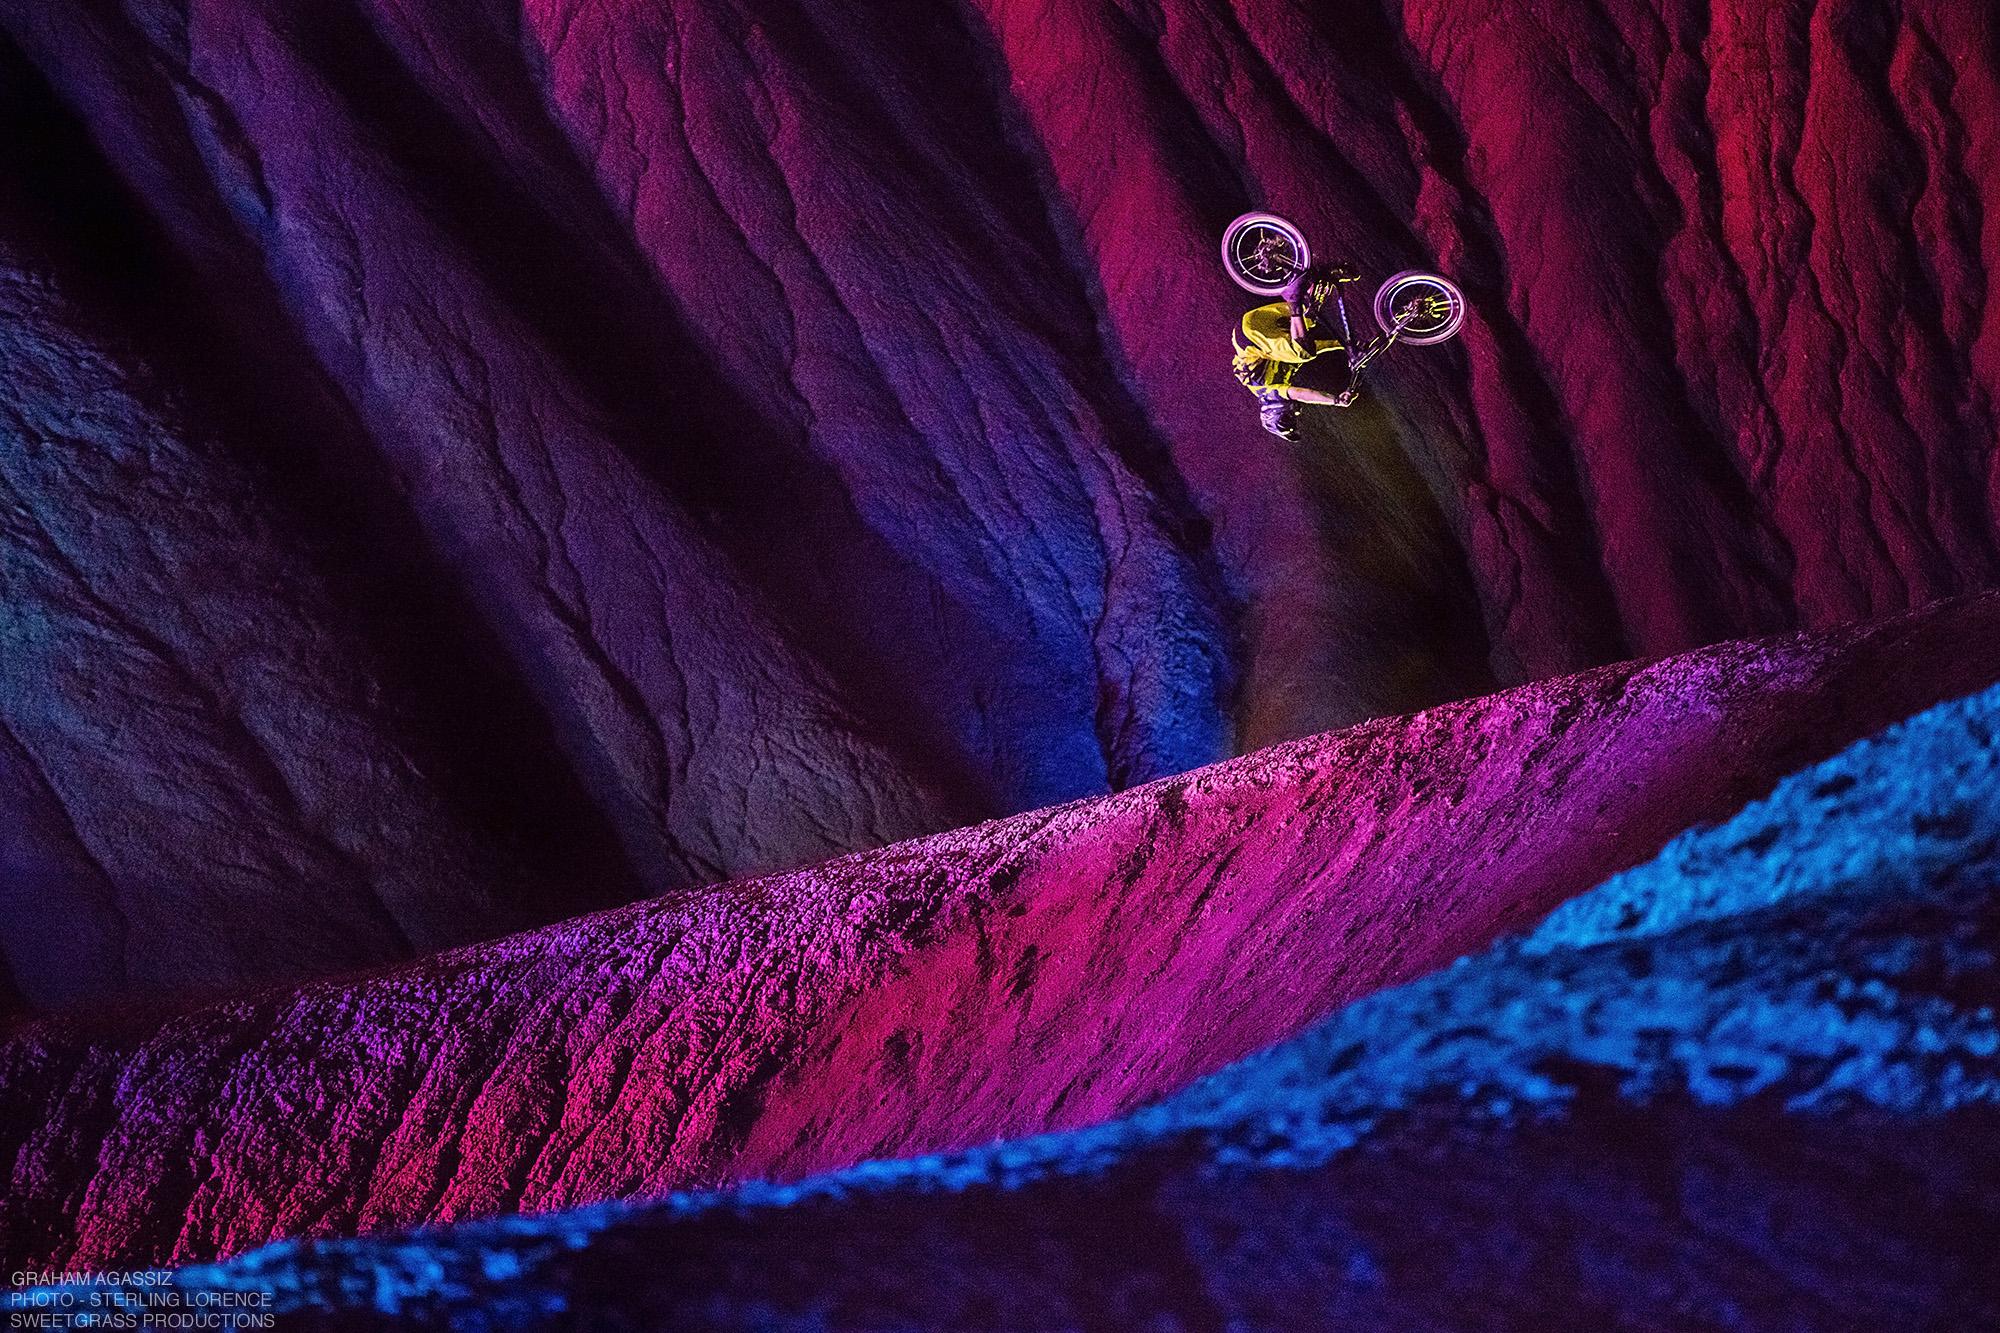 philips-ambilght-tv-mountain-bike-.jpg